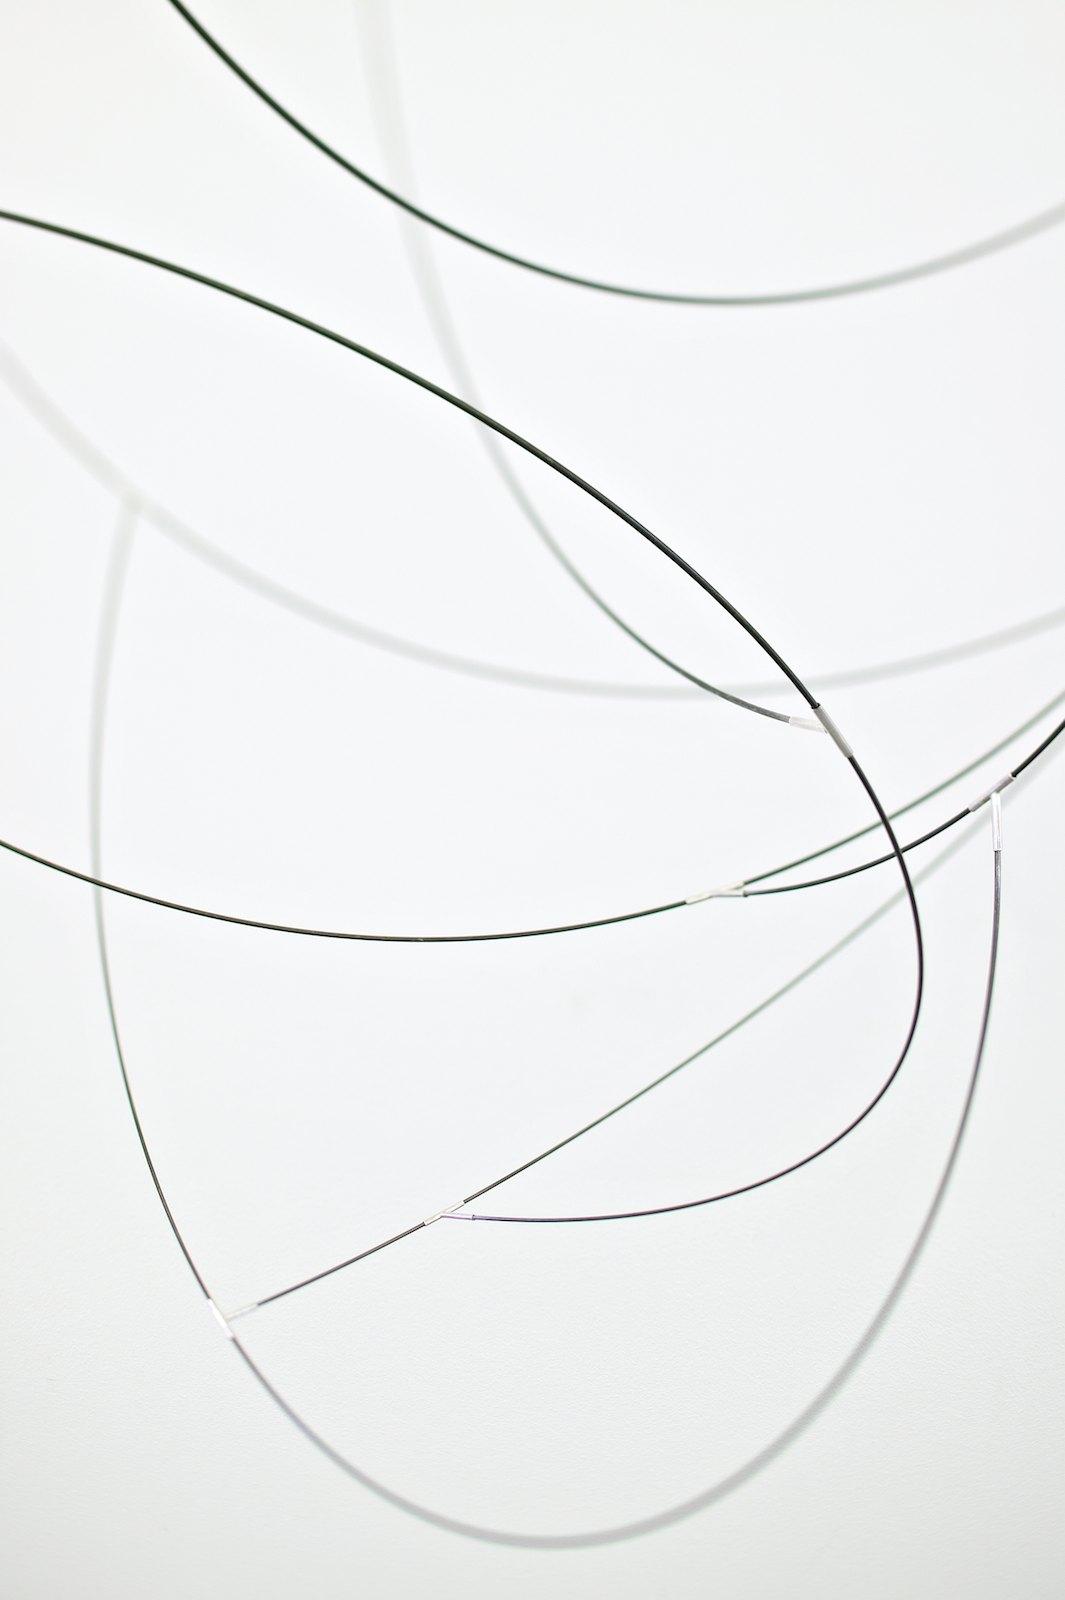 Sculpture III, 2007, steel, silver, 180 x 70 x 80 cm, detail